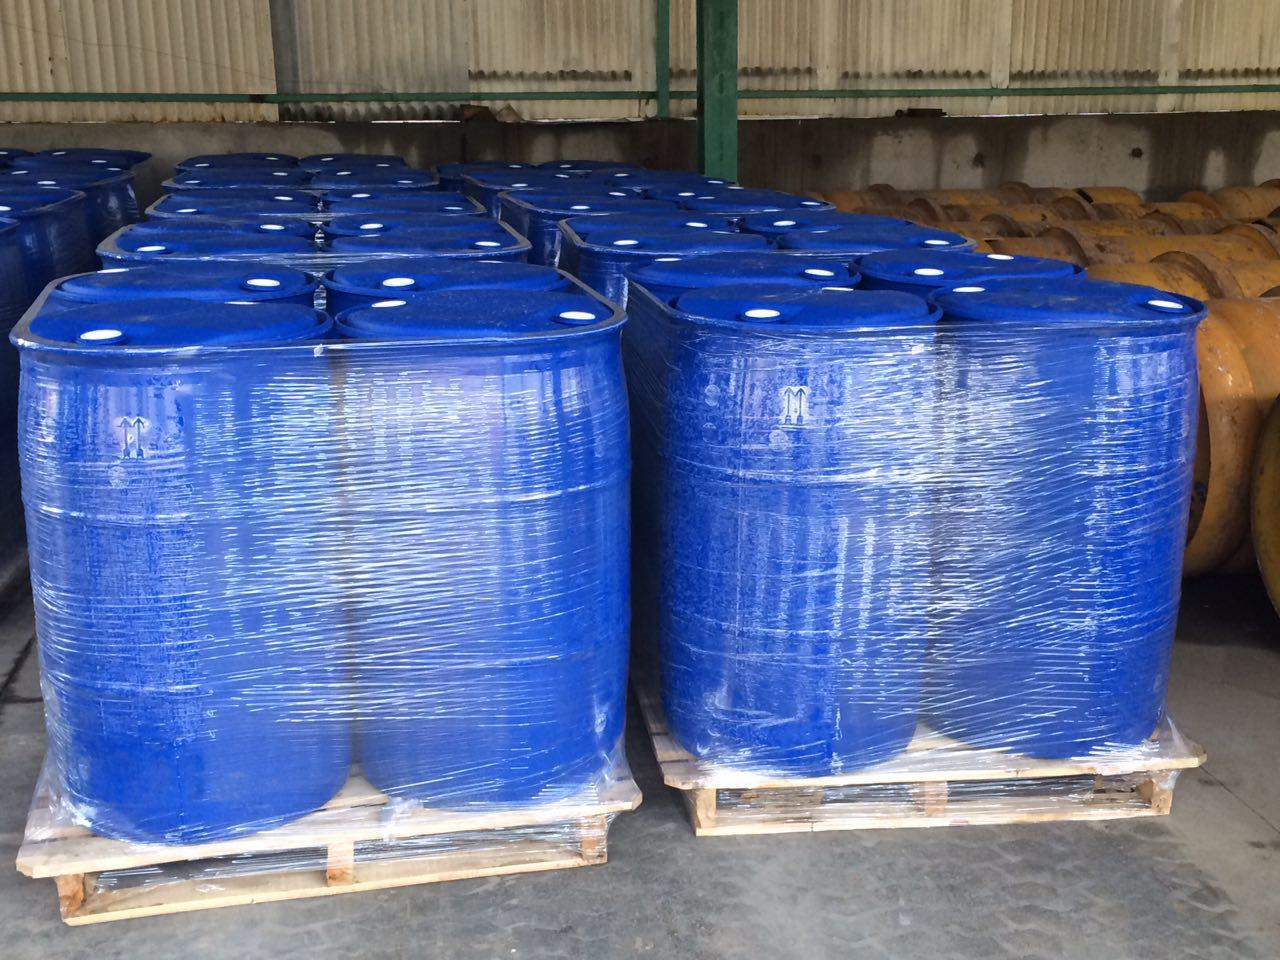 Sodium hypochlorite (NaClO) Sodium (NaClO) hypochlorite (NaClO) (NaClO)